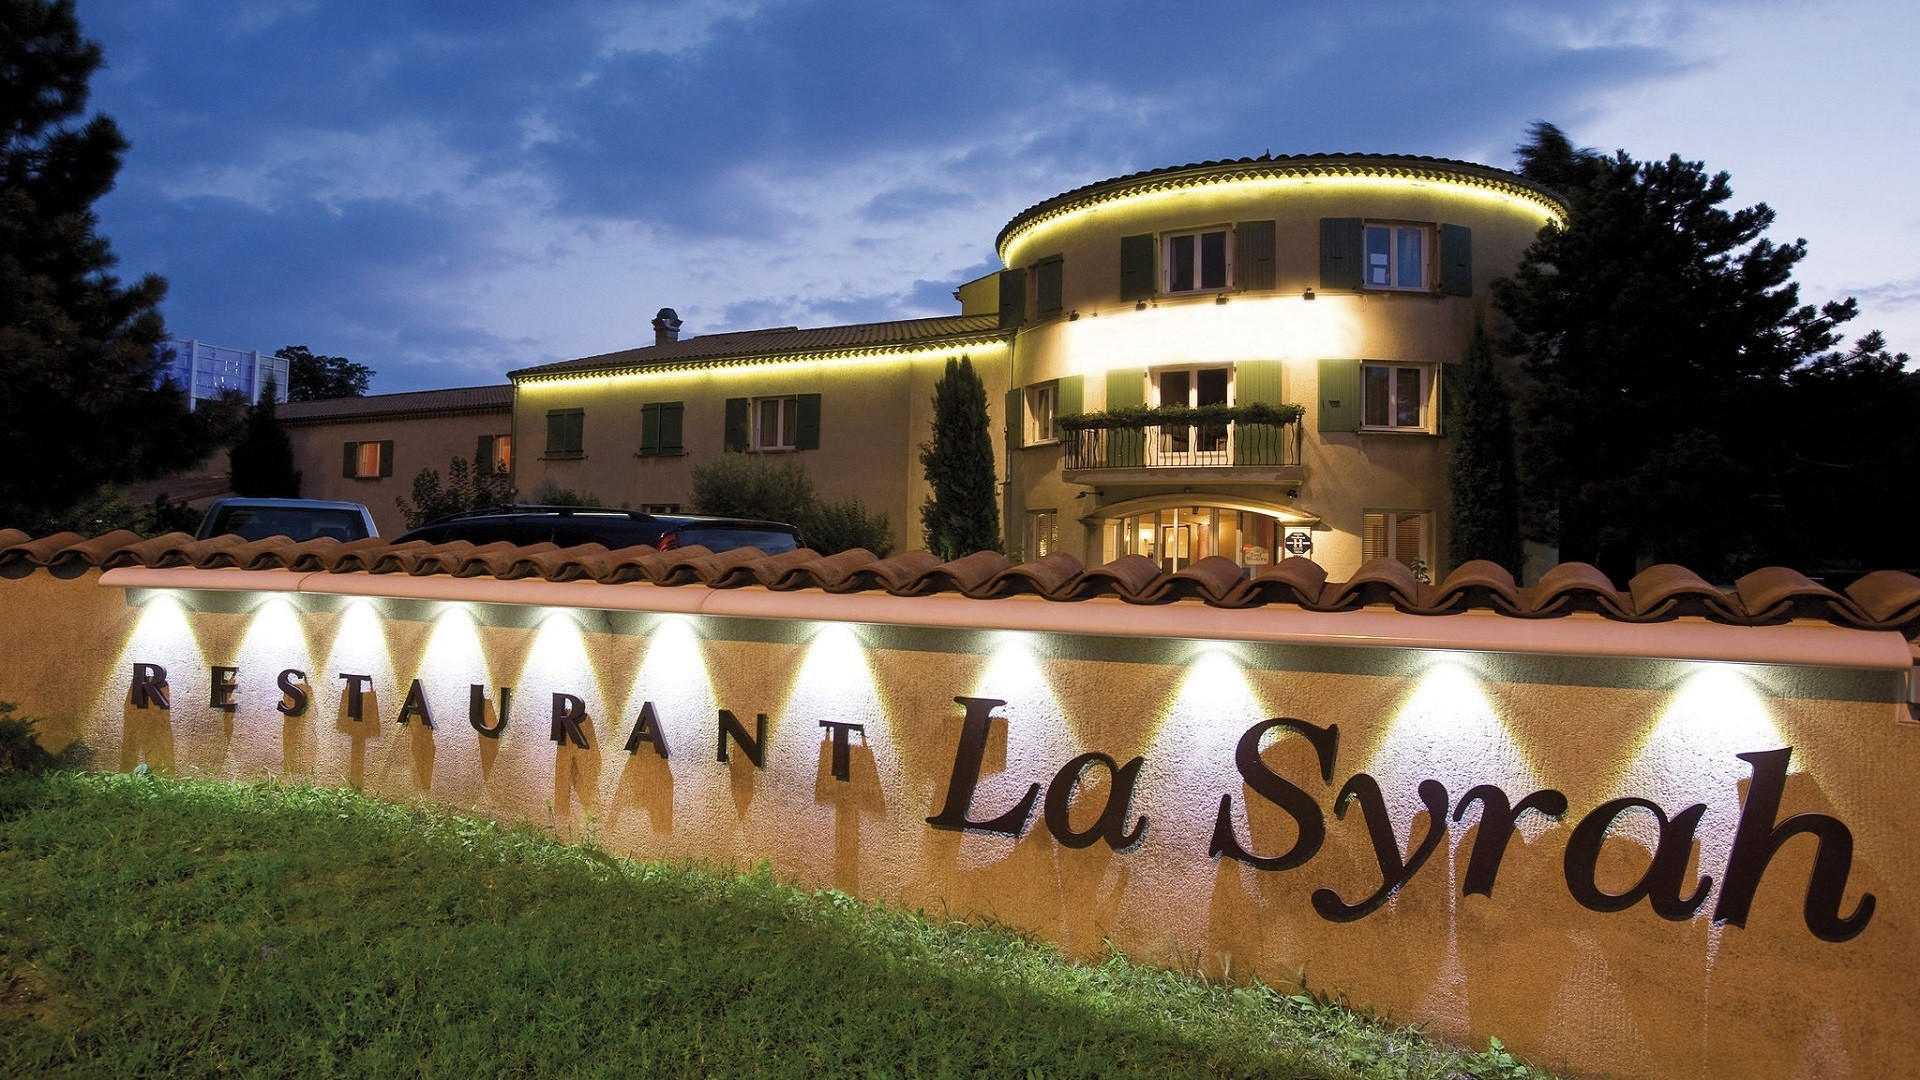 Clos-Syrah-Valence-seminaires-de-caractere-best-western